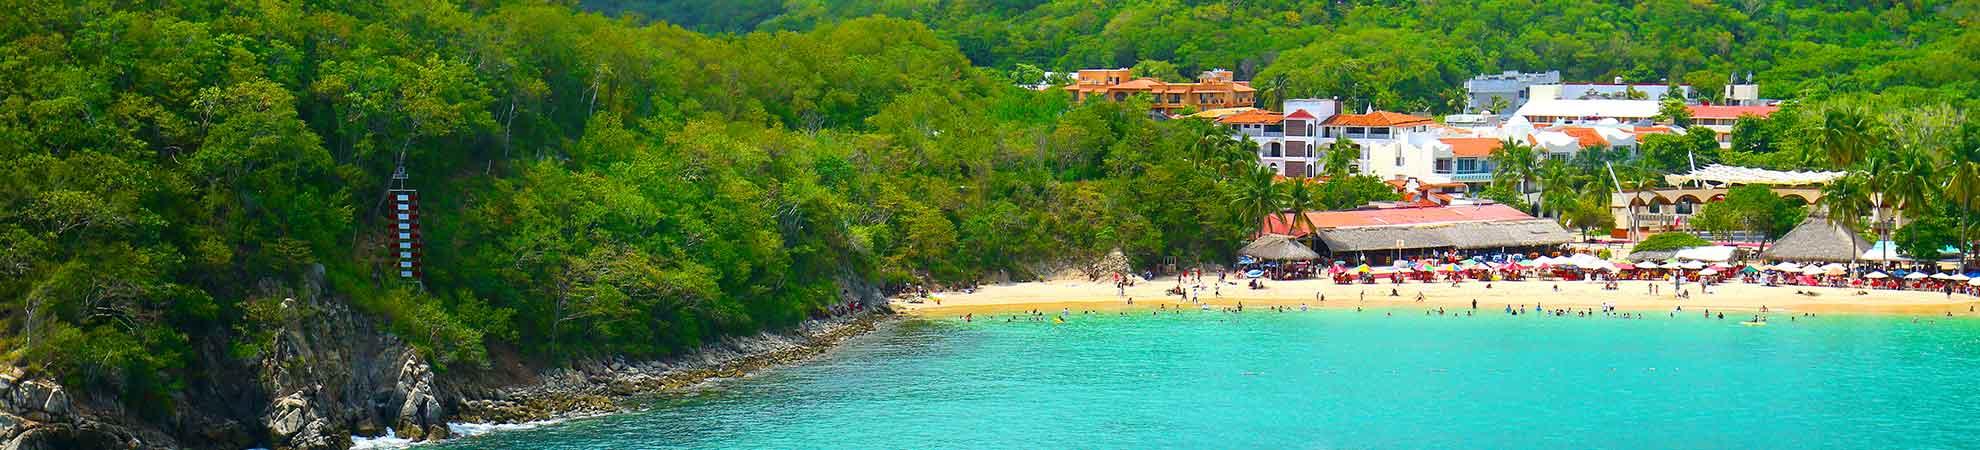 Vacances Mexique août